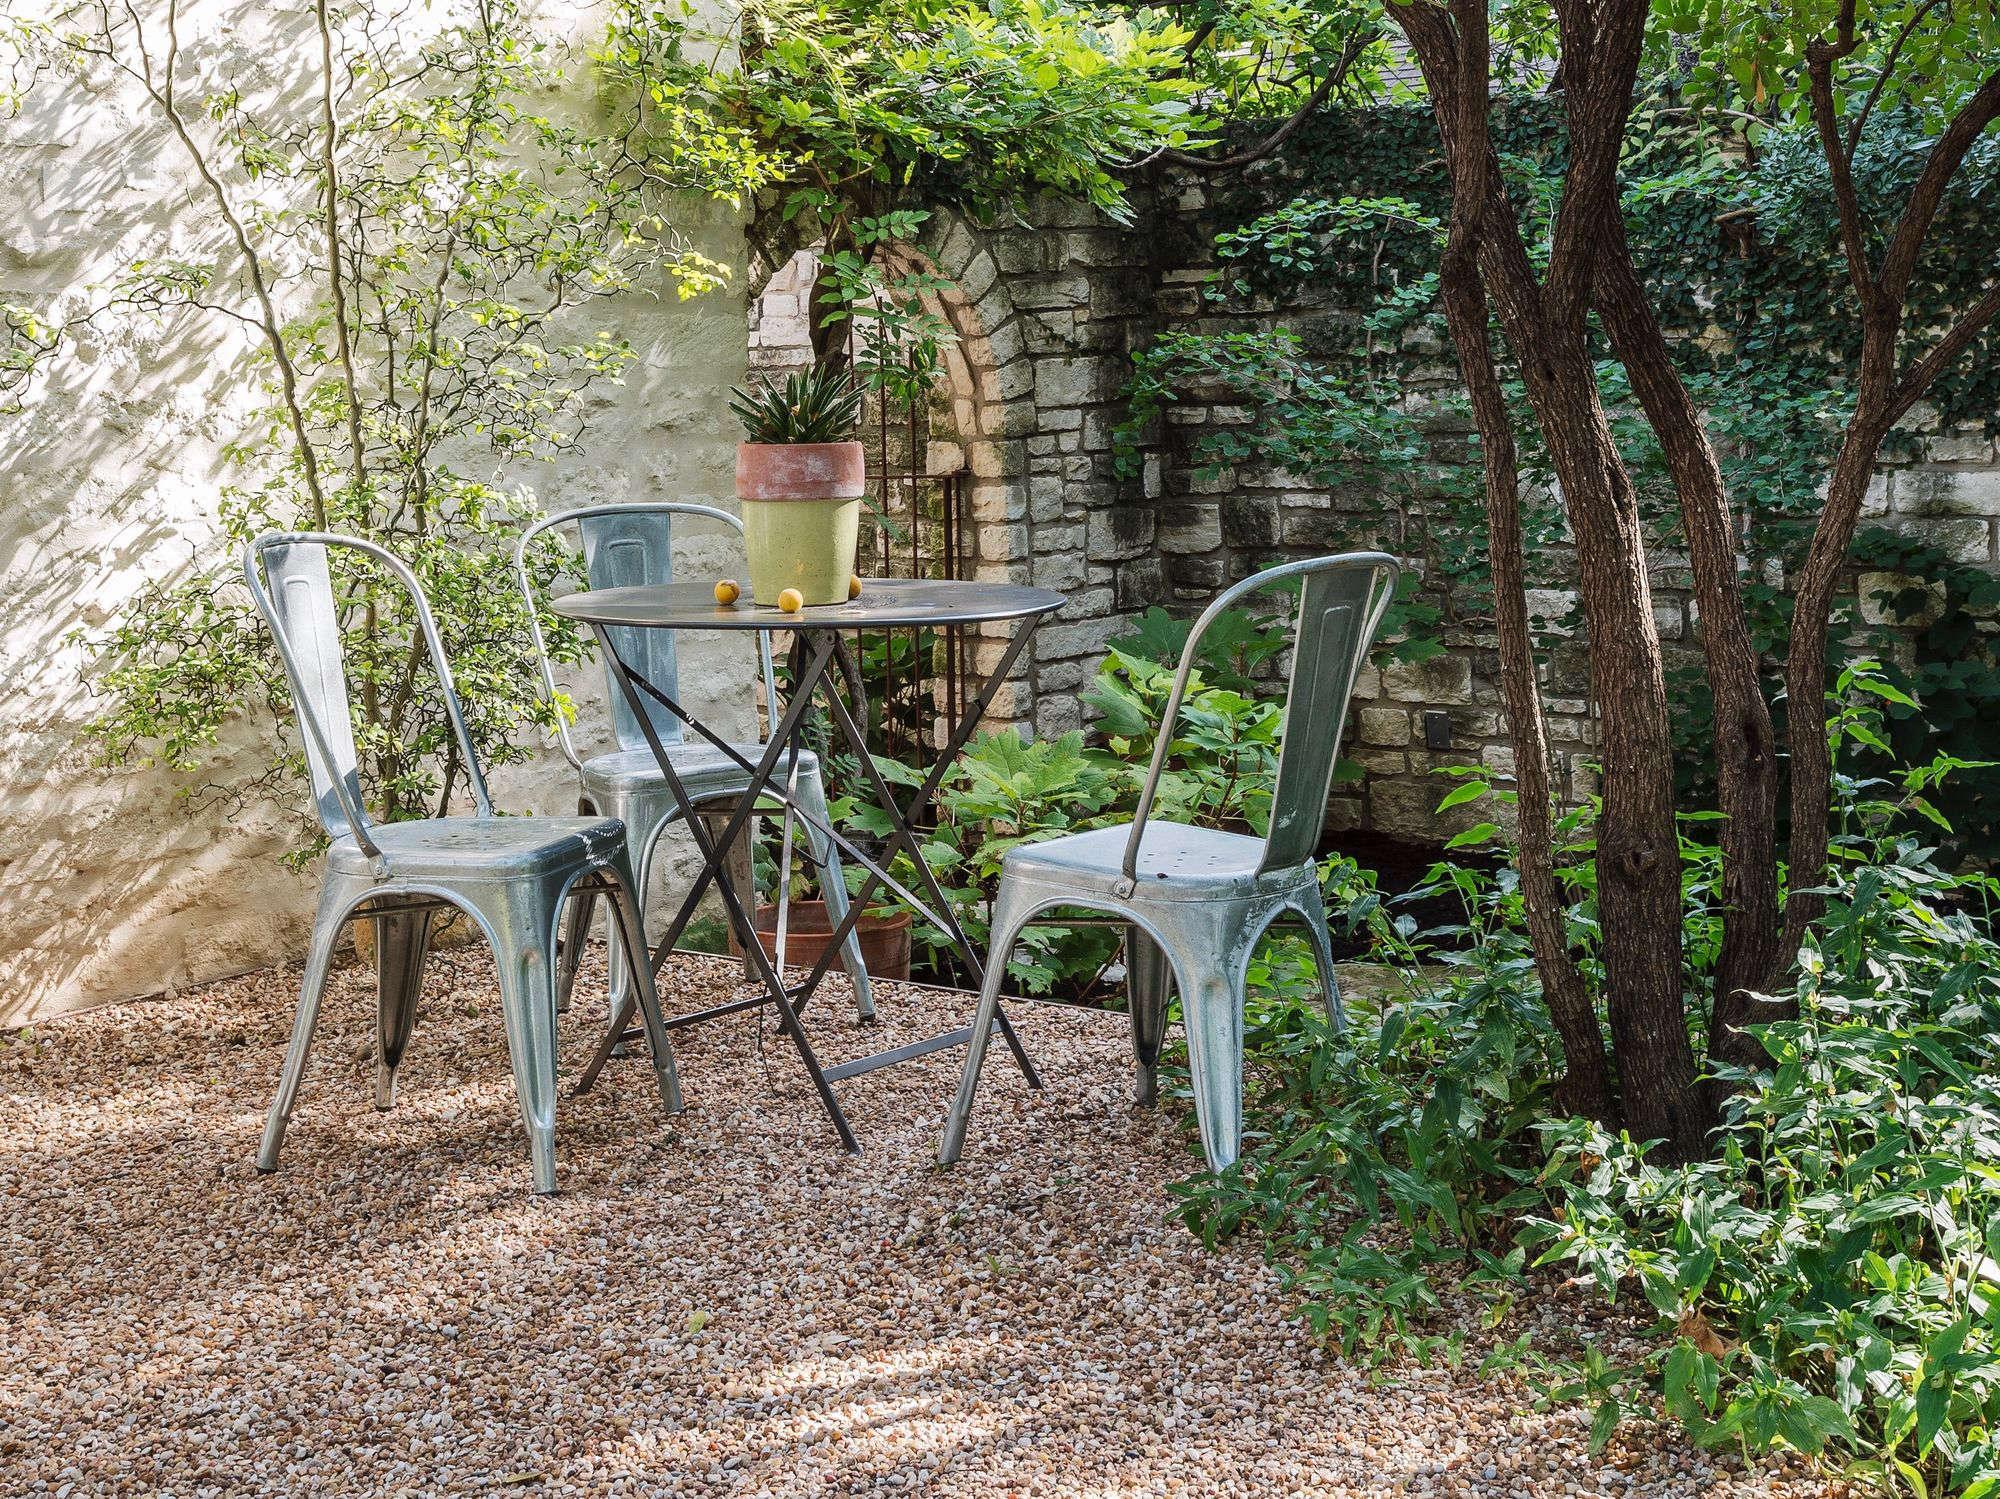 The New Gravel Backyard: 10 Inspiring Landscape Designs ... on Backyard With Gravel Ideas id=24623